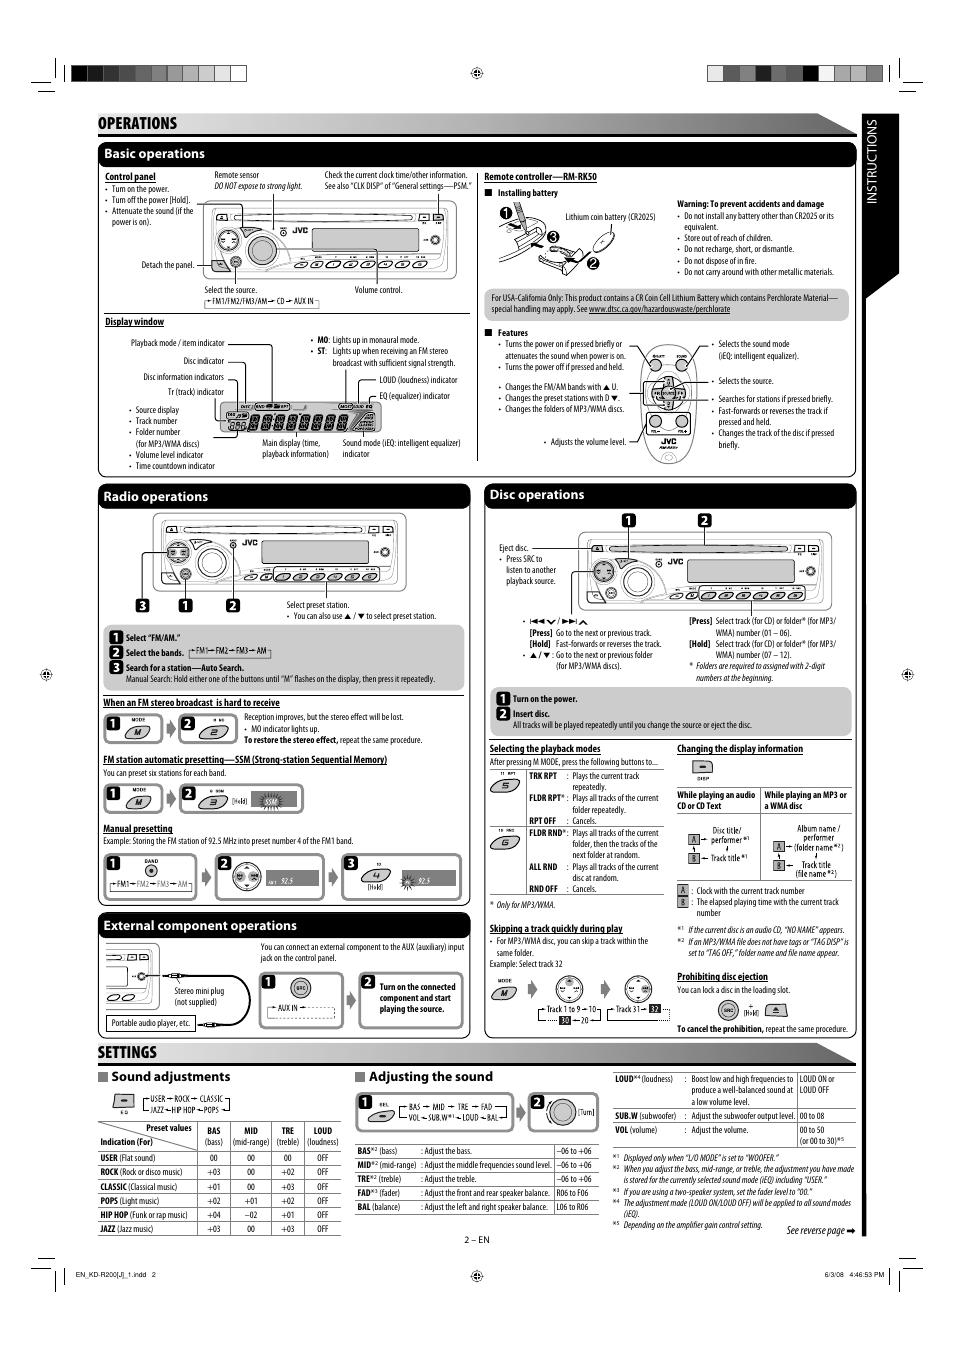 Jvc Kd S29 Manual Pdf Avx1 Wiring Diagram Head Unit Installation Avs Forum Home Theater